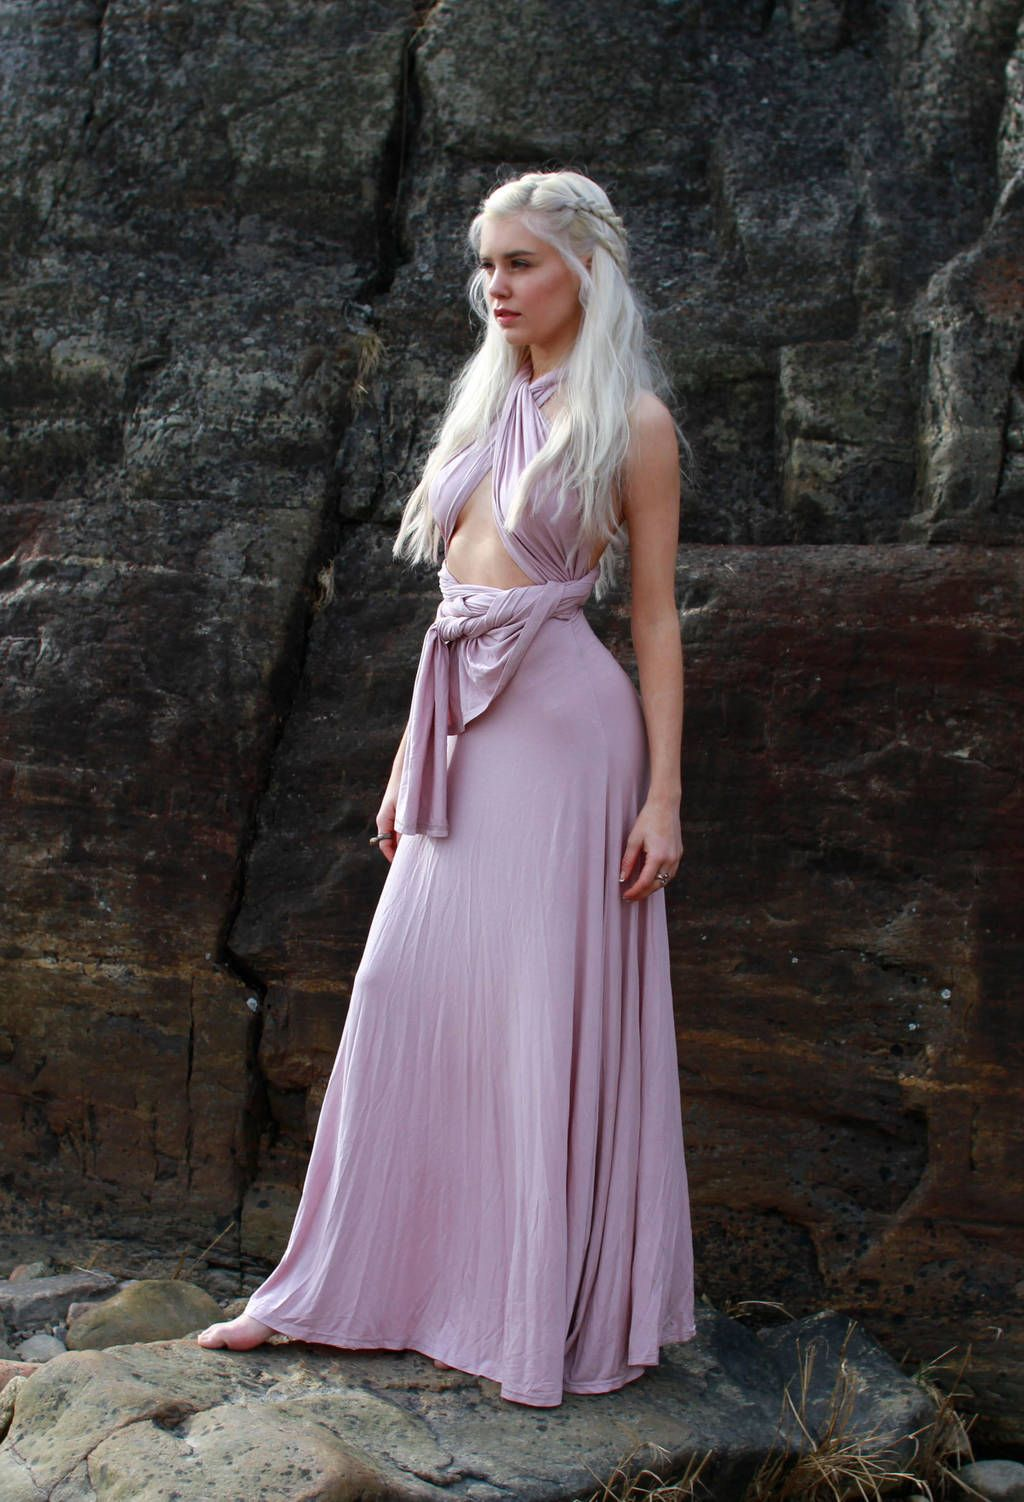 Who is Daenerys? - Quora